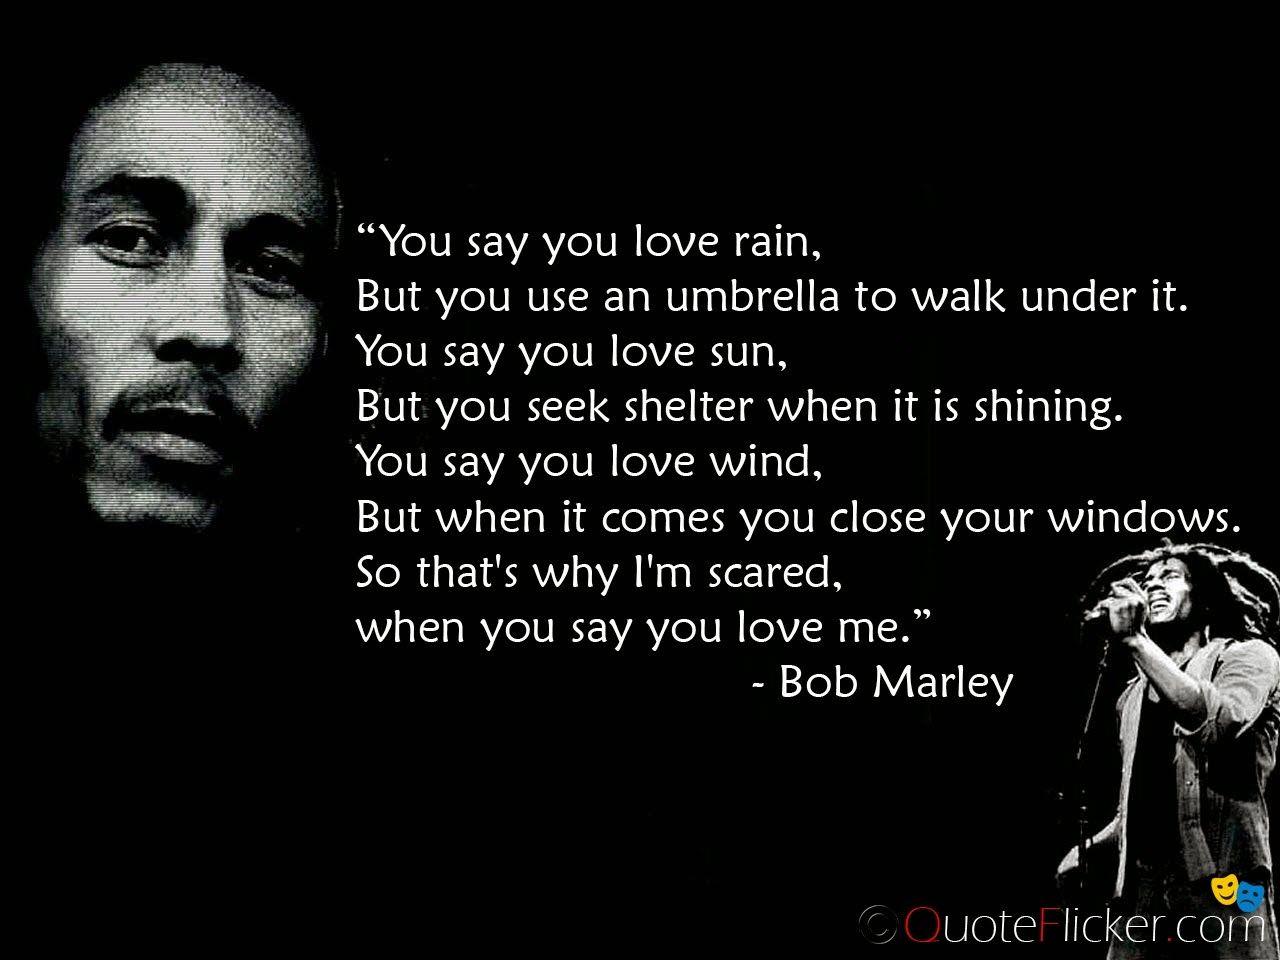 Https Www Google Pt Blank Html Bob Marley Quotes Best Bob Marley Quotes Love Me Quotes